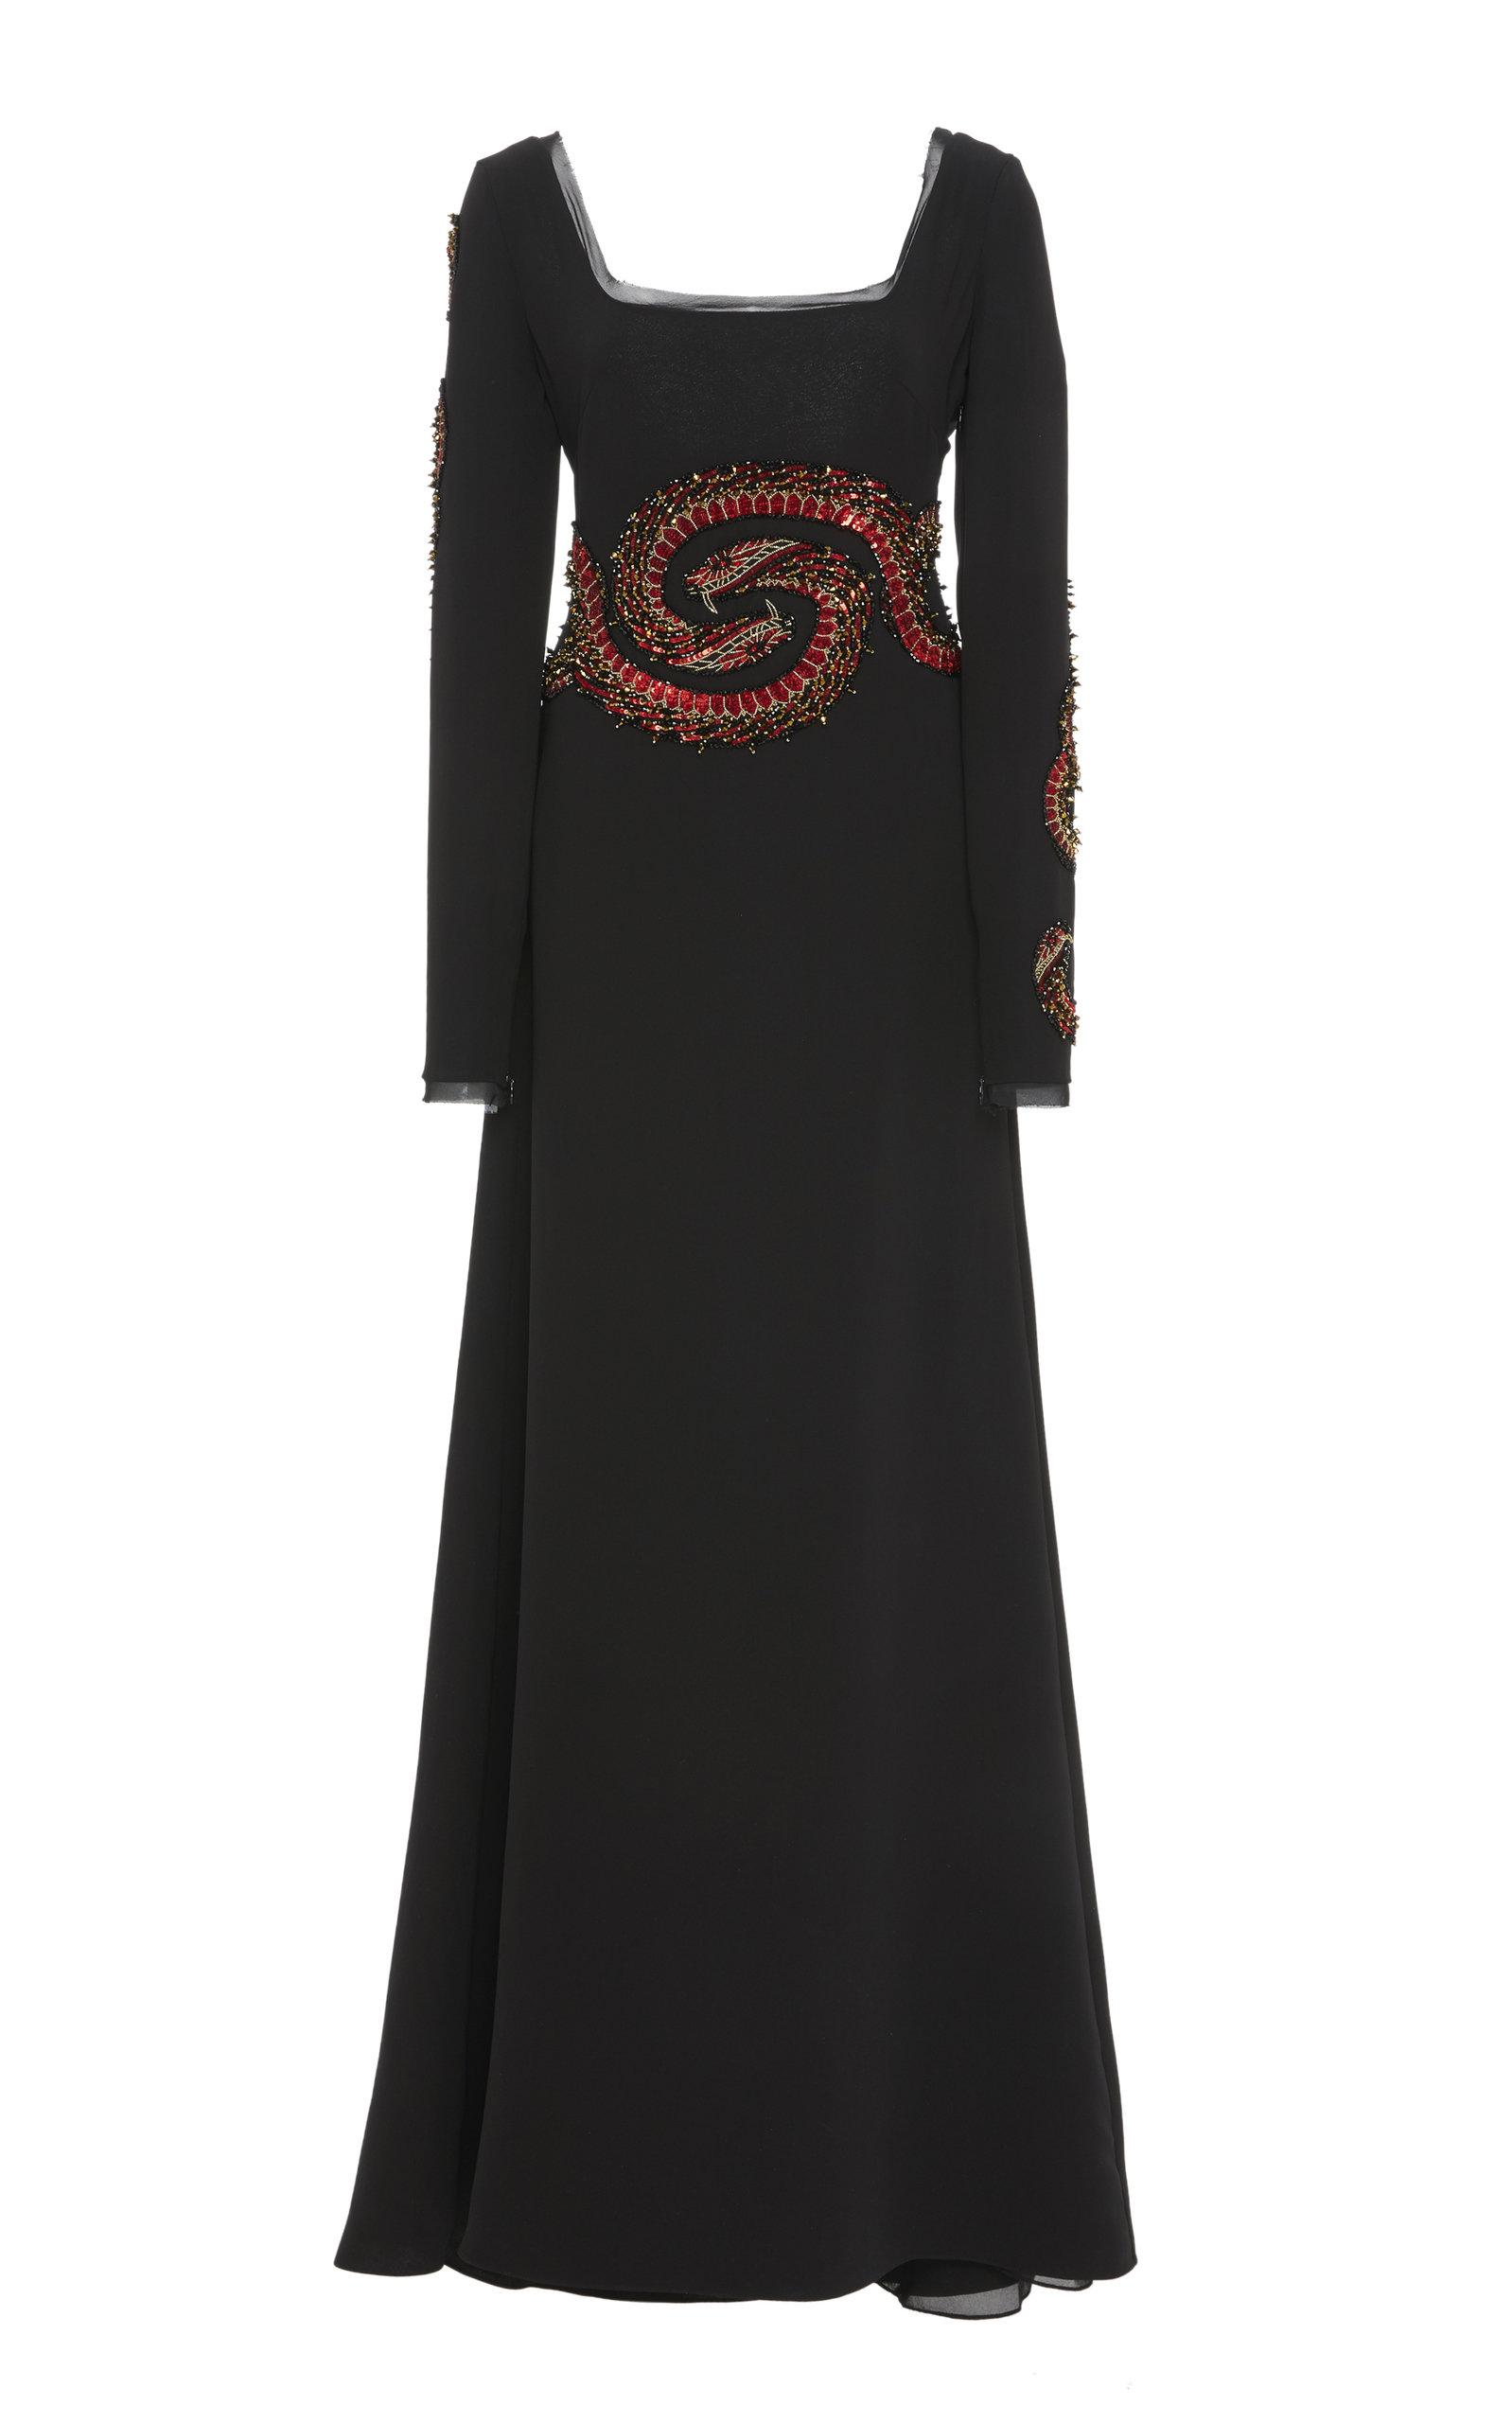 CUCCULELLI SHAHEEN SNAKE NOUVEAU DRESS